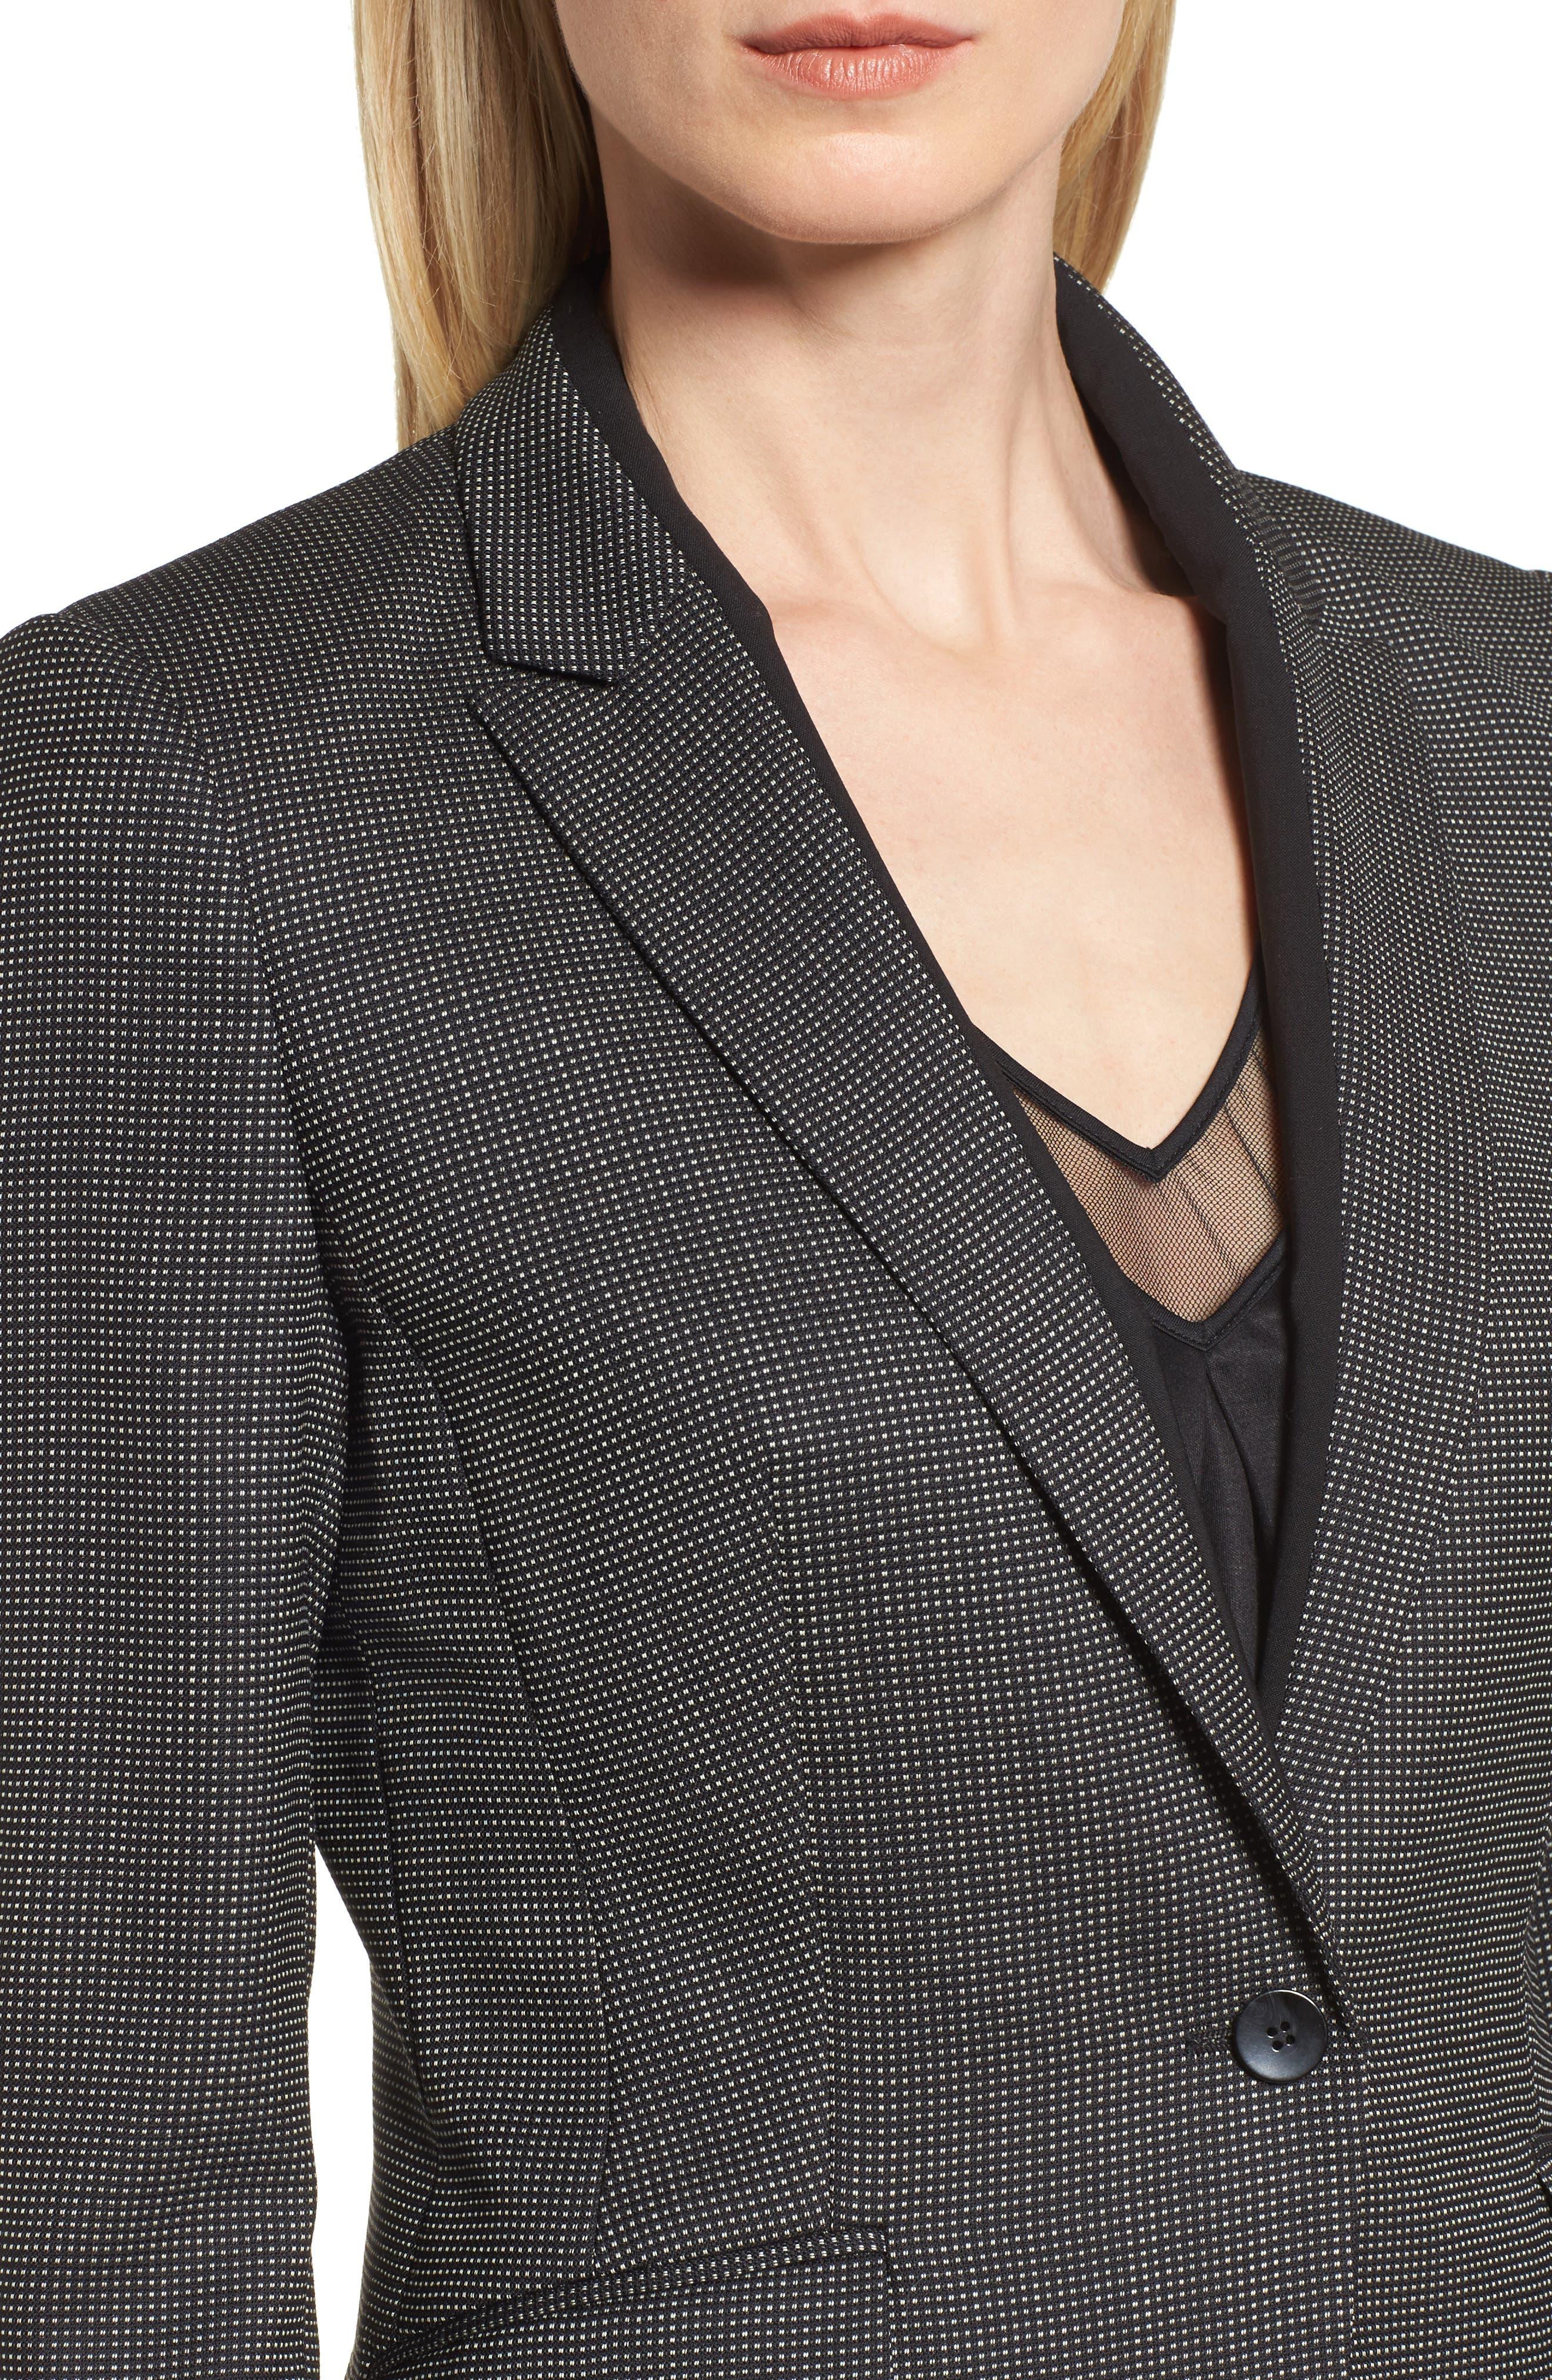 Jeresa Check Stretch Wool Suit Jacket,                             Alternate thumbnail 4, color,